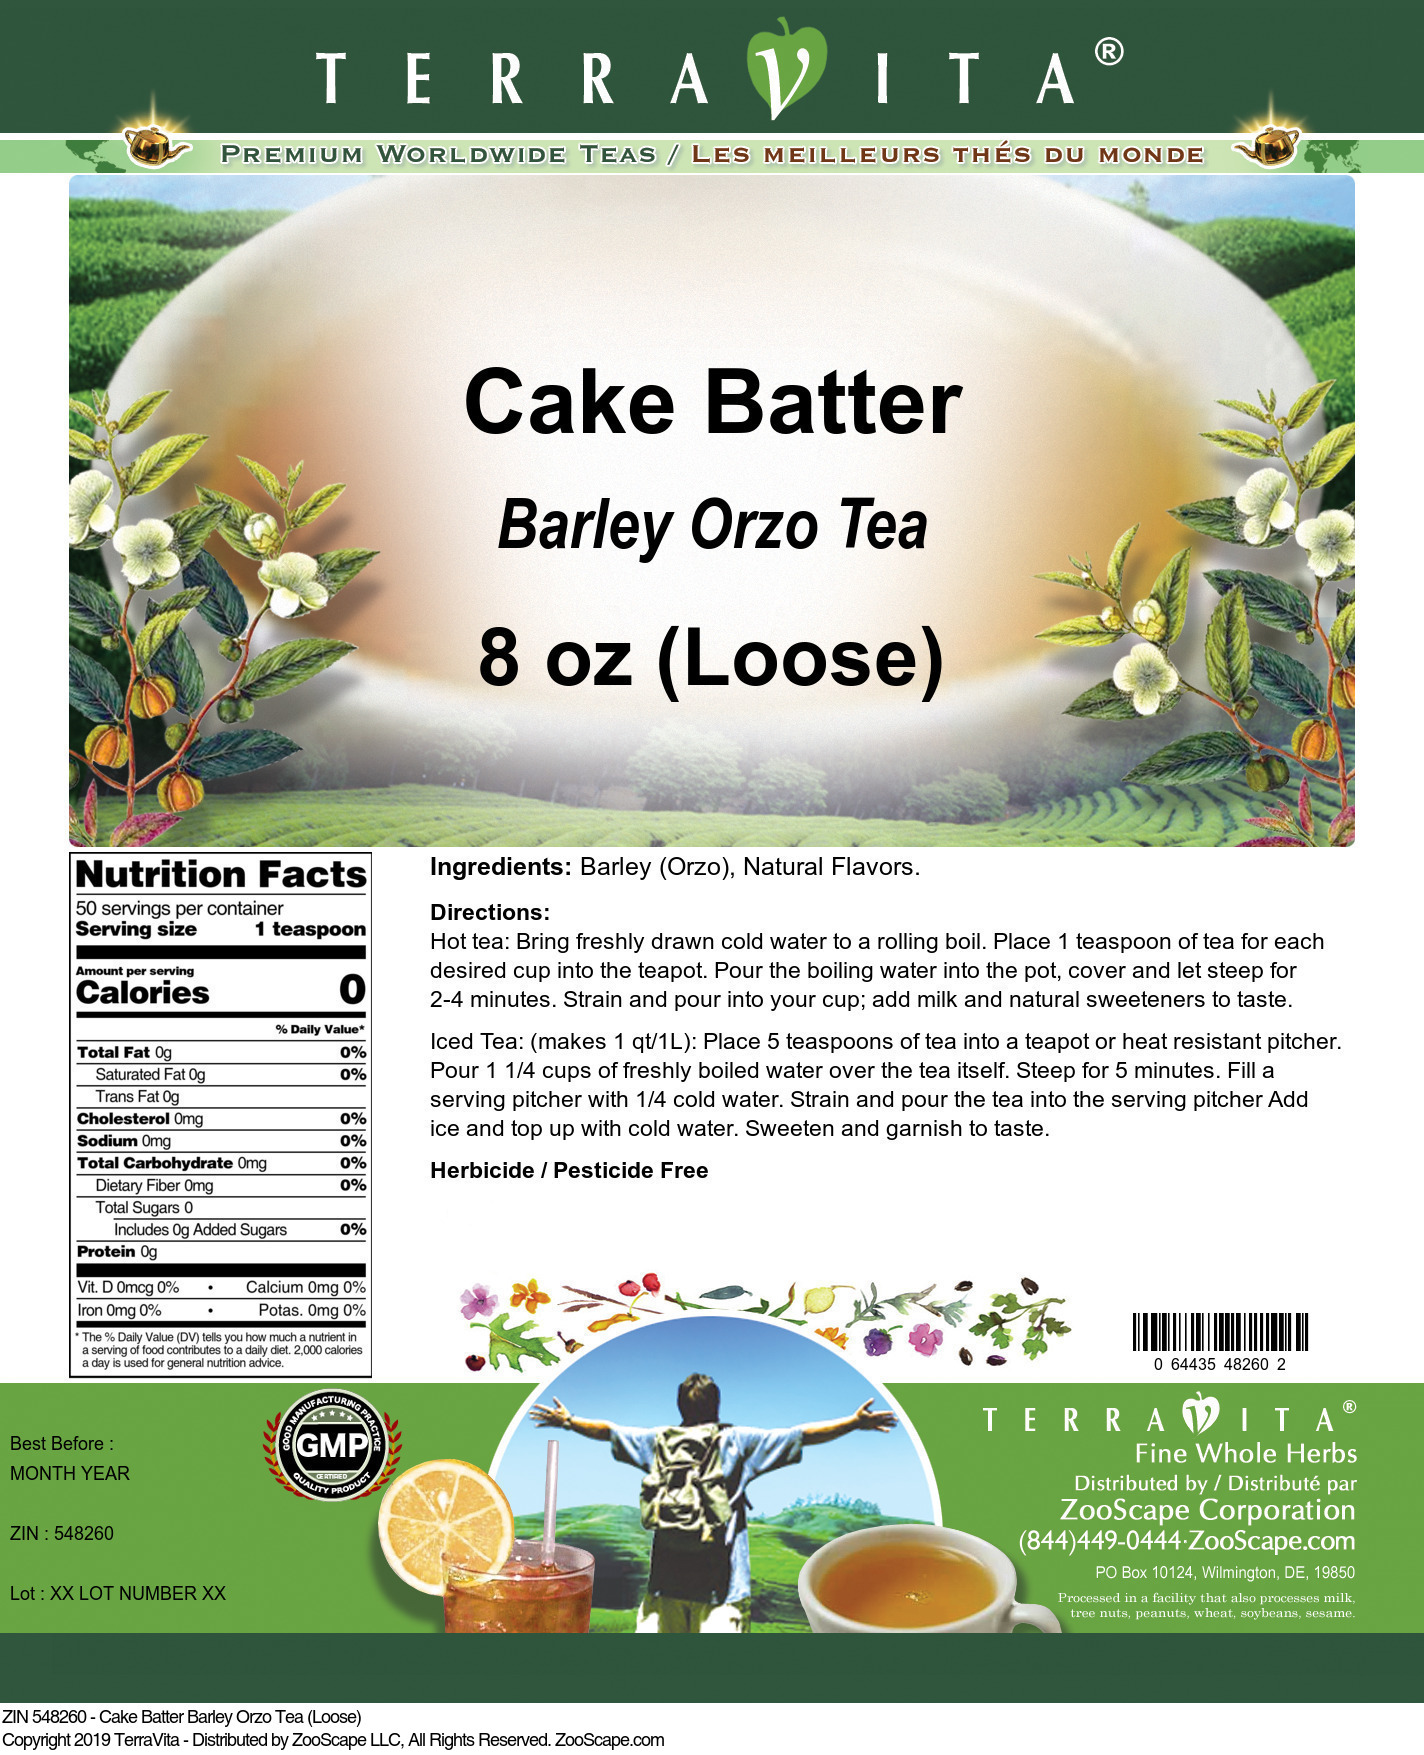 Cake Batter Barley Orzo